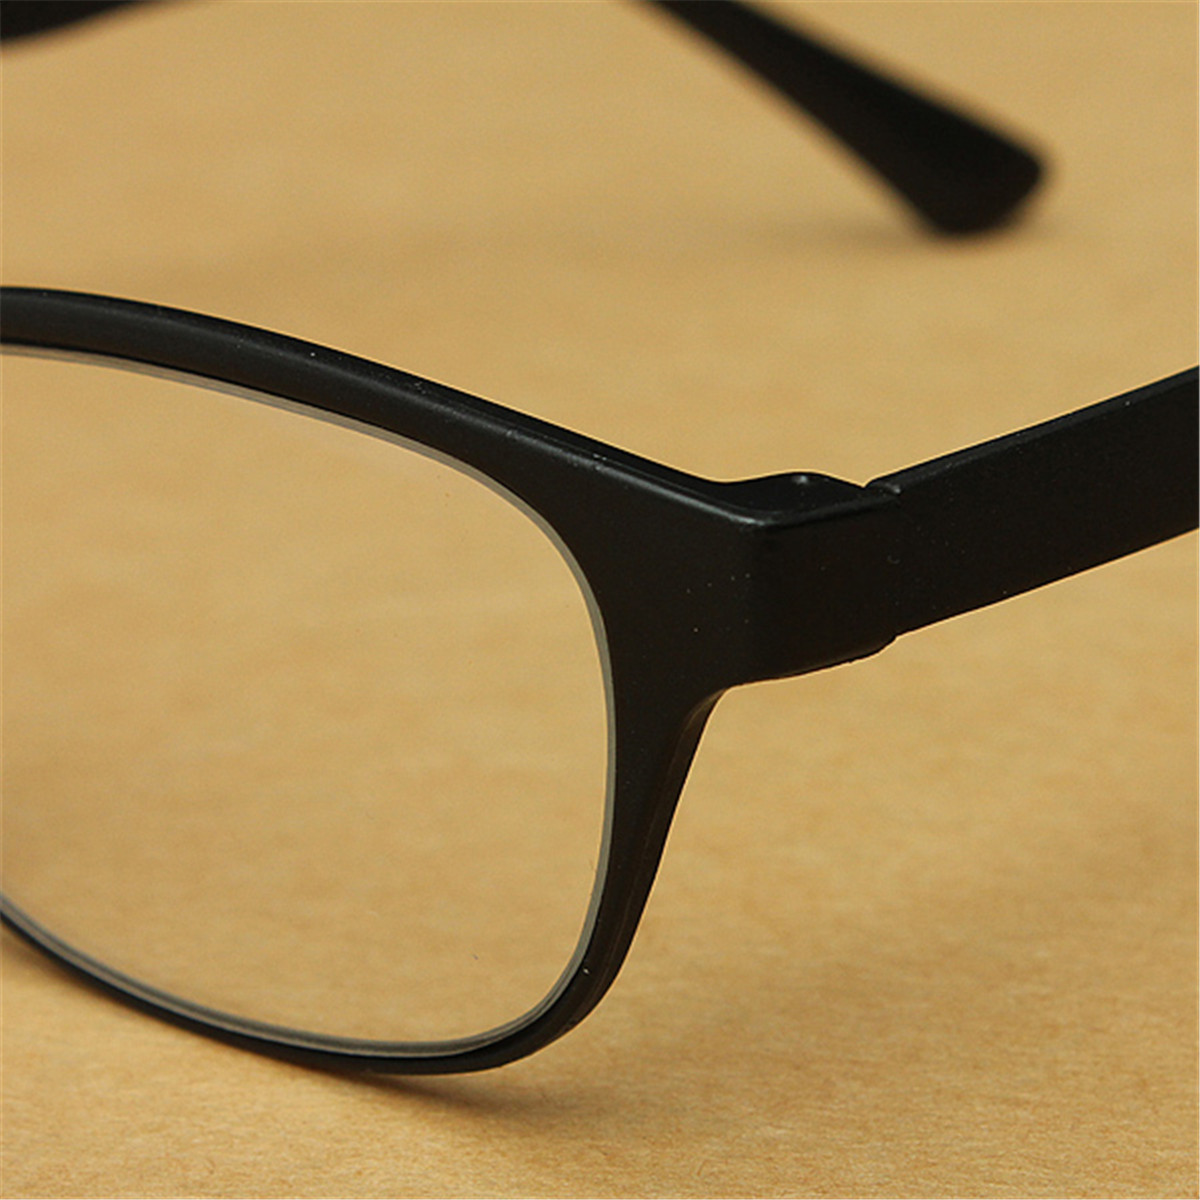 Plastic Framed Fashion Glasses : Men Women Fashion Matte Surface Portable Reading Glasses ...